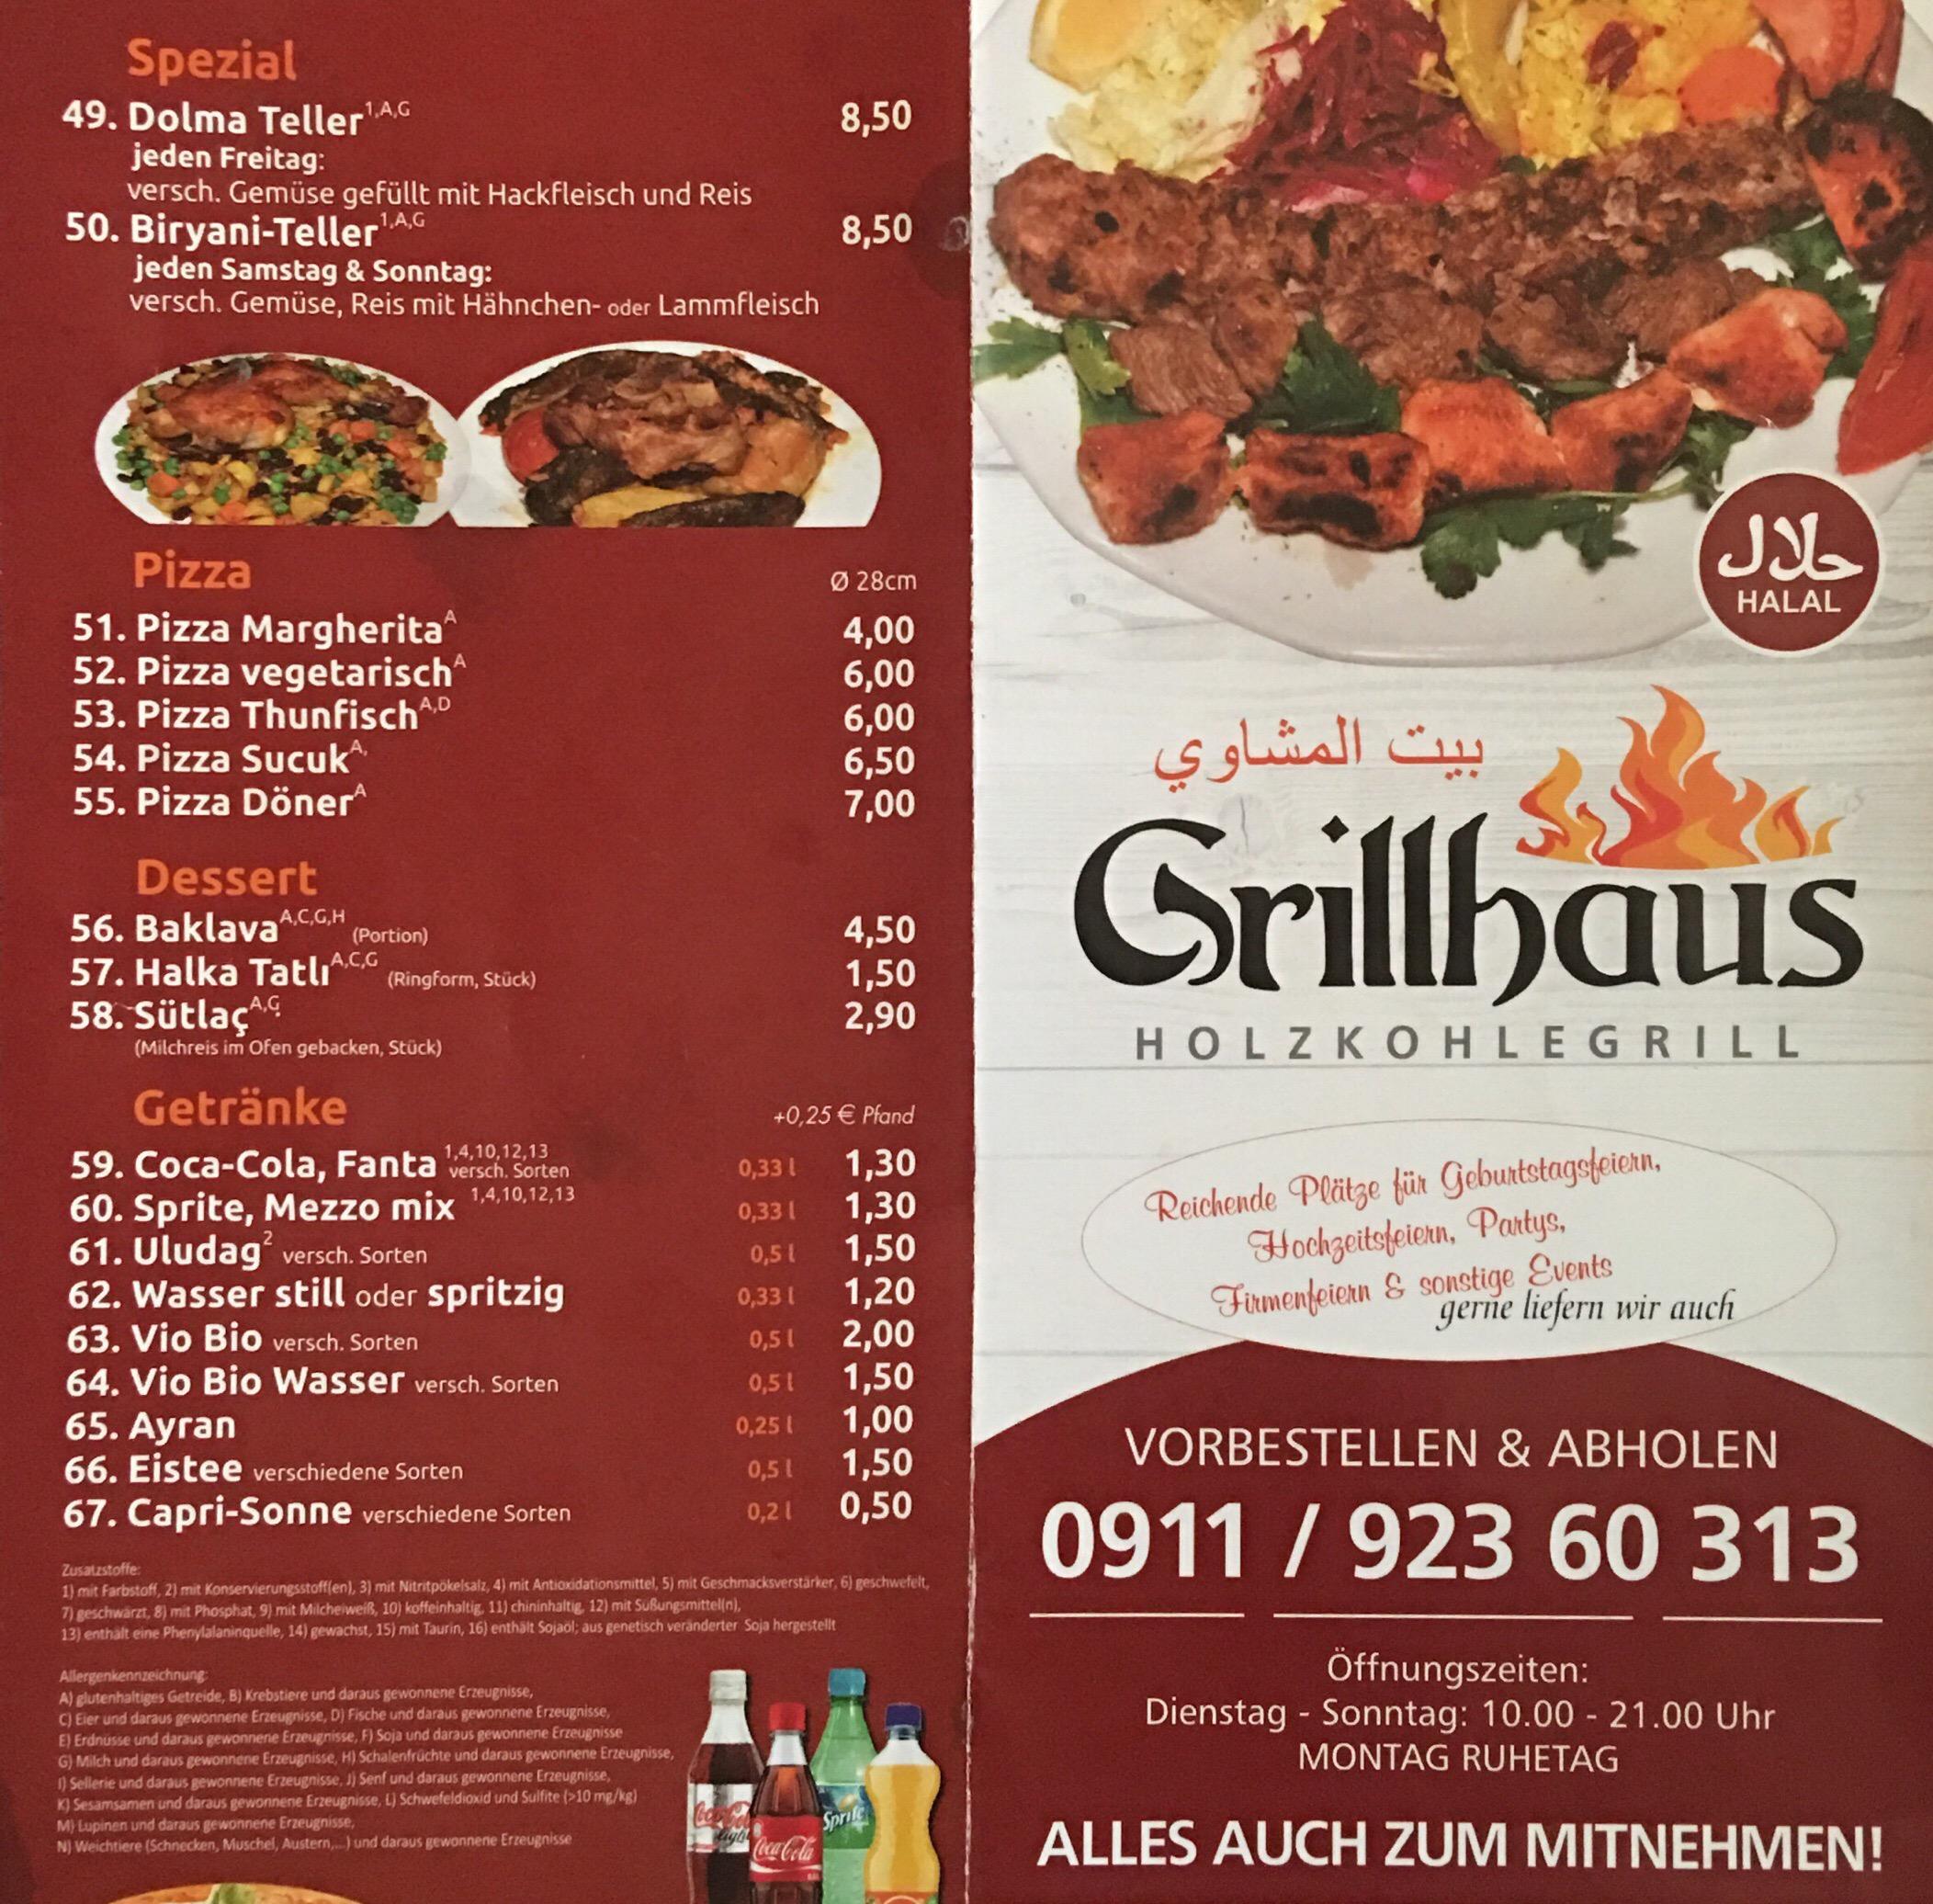 Grillhaus Restaurant Furth Lebanese Mediterranean Cuisine Near